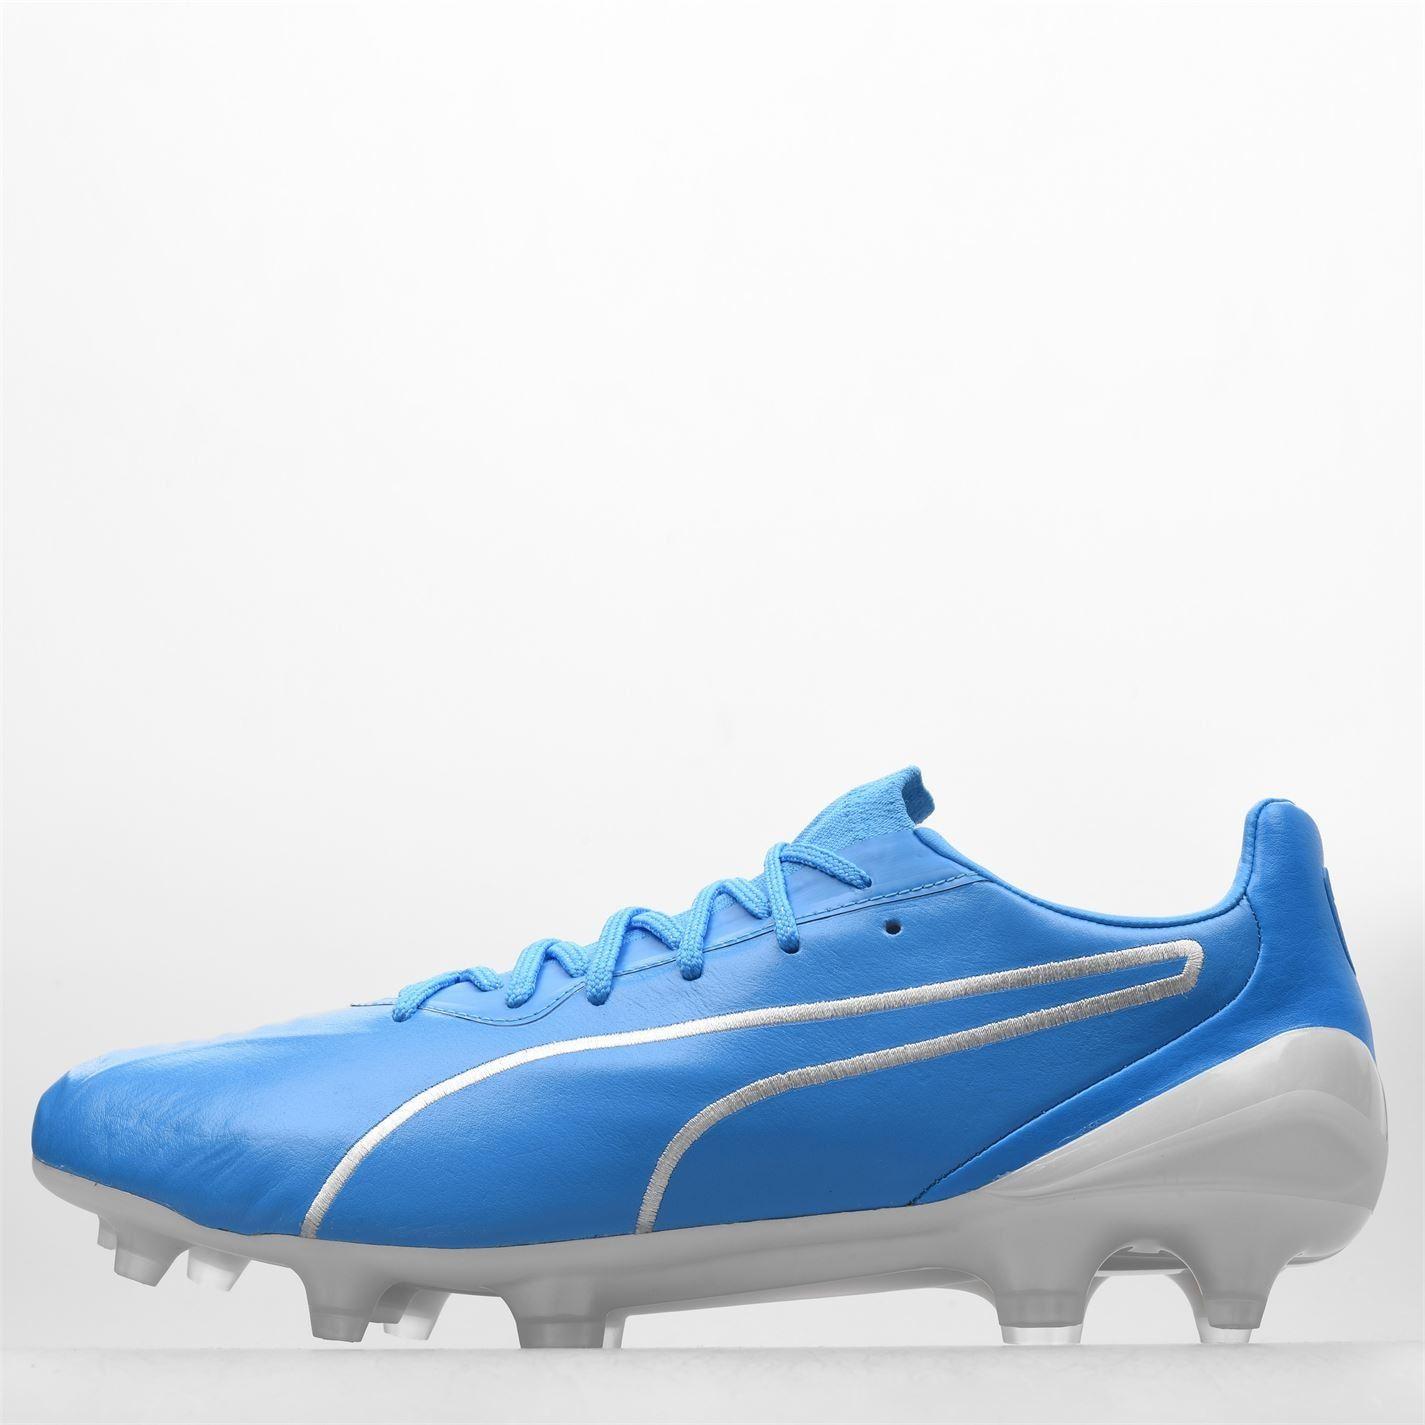 miniature 11 - Puma-King-FG-Firm-Ground-Football-Bottes-Homme-Chaussures-De-Foot-Crampons-Baskets